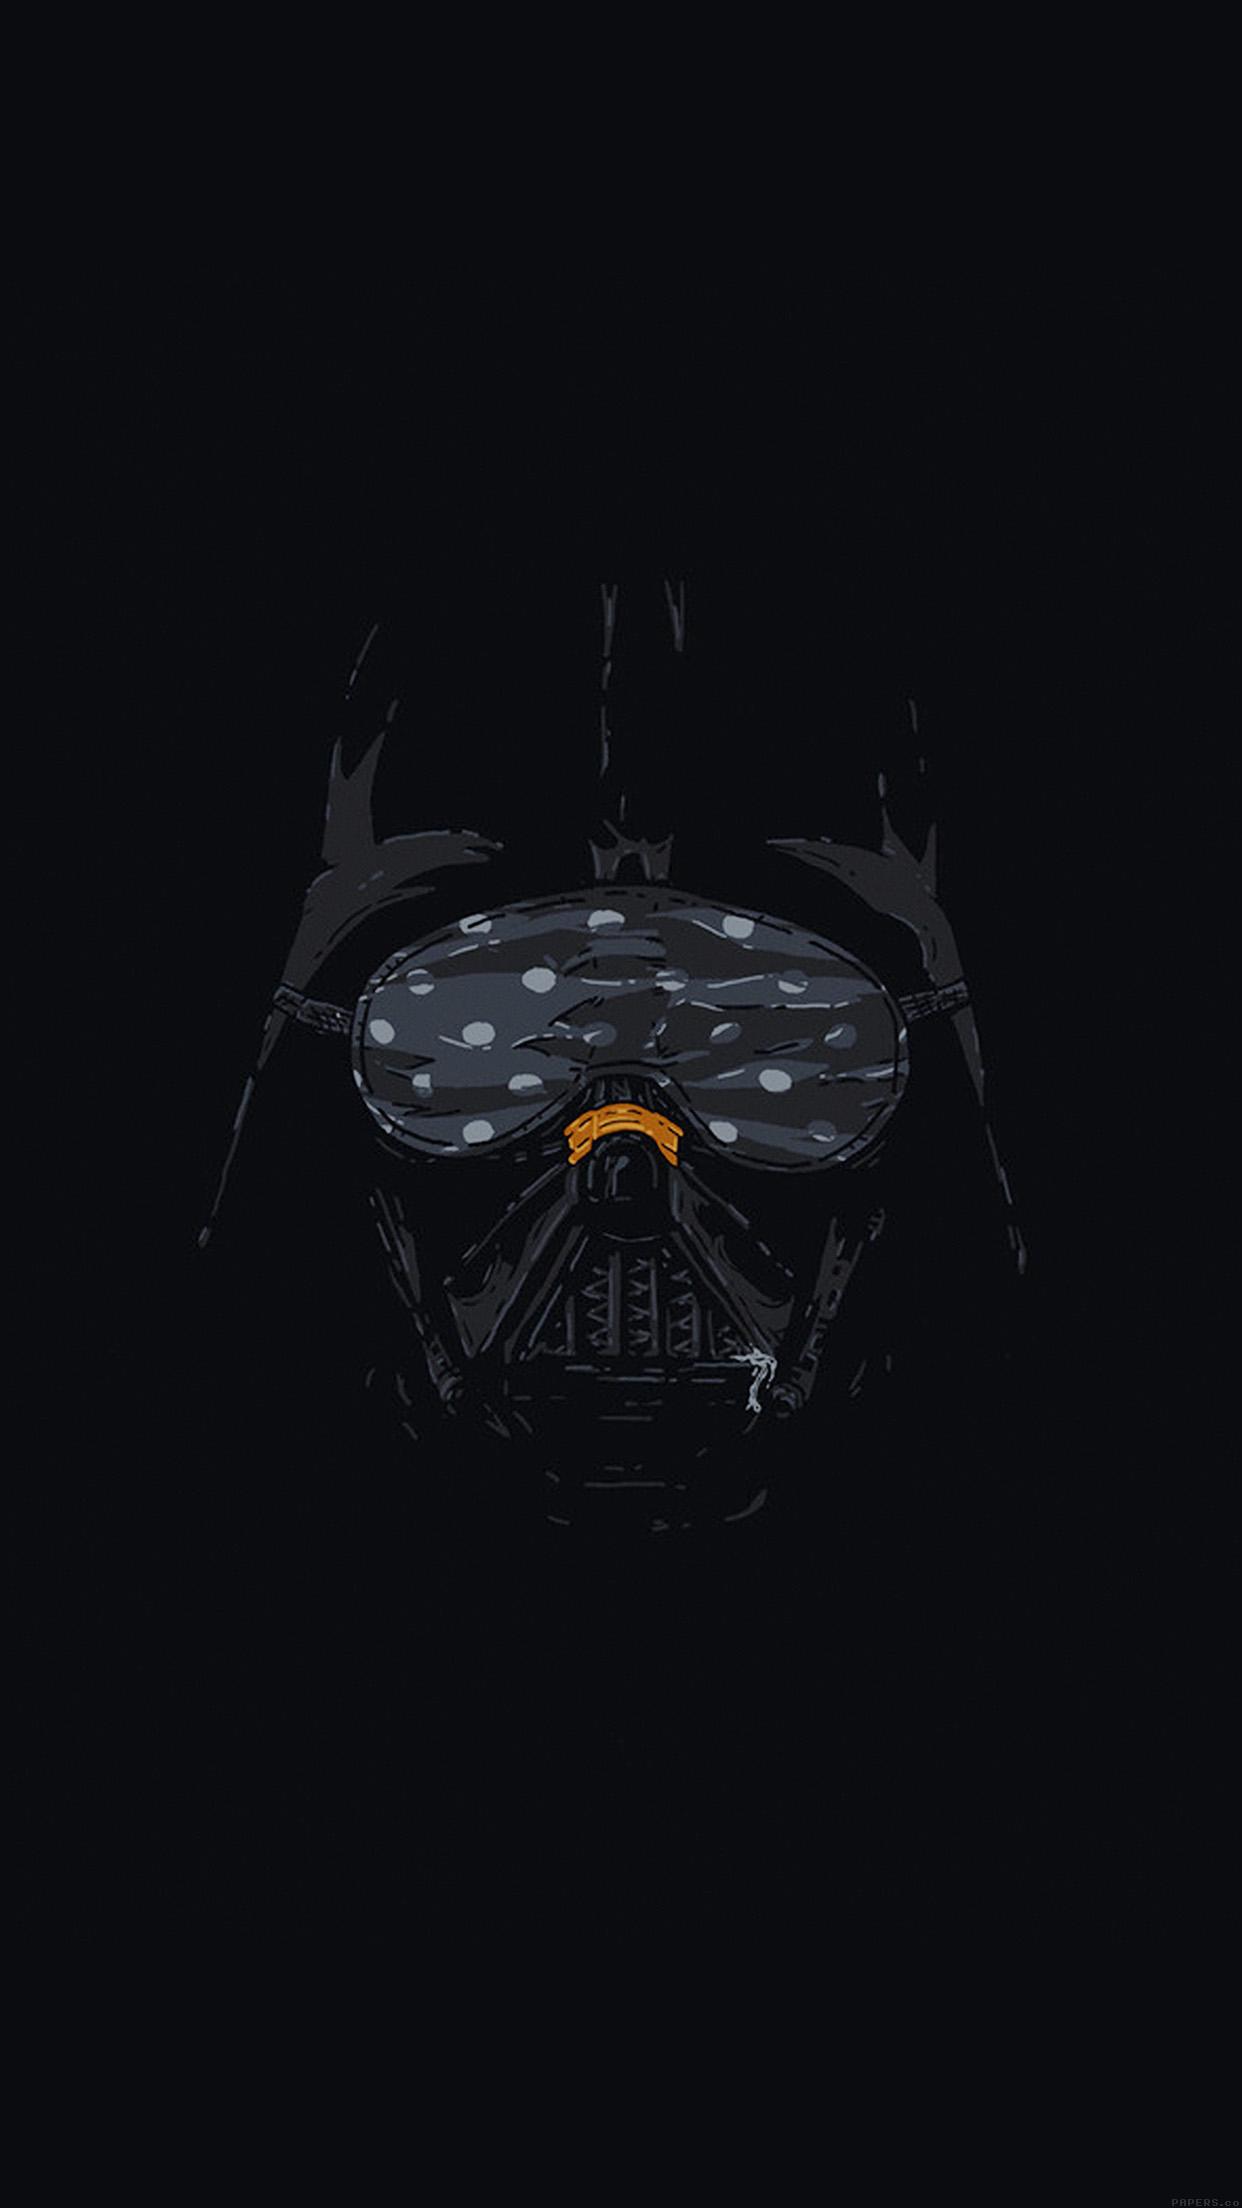 Iphone7papers Ah87 Darth Vader Minimal Starwars Illust Art